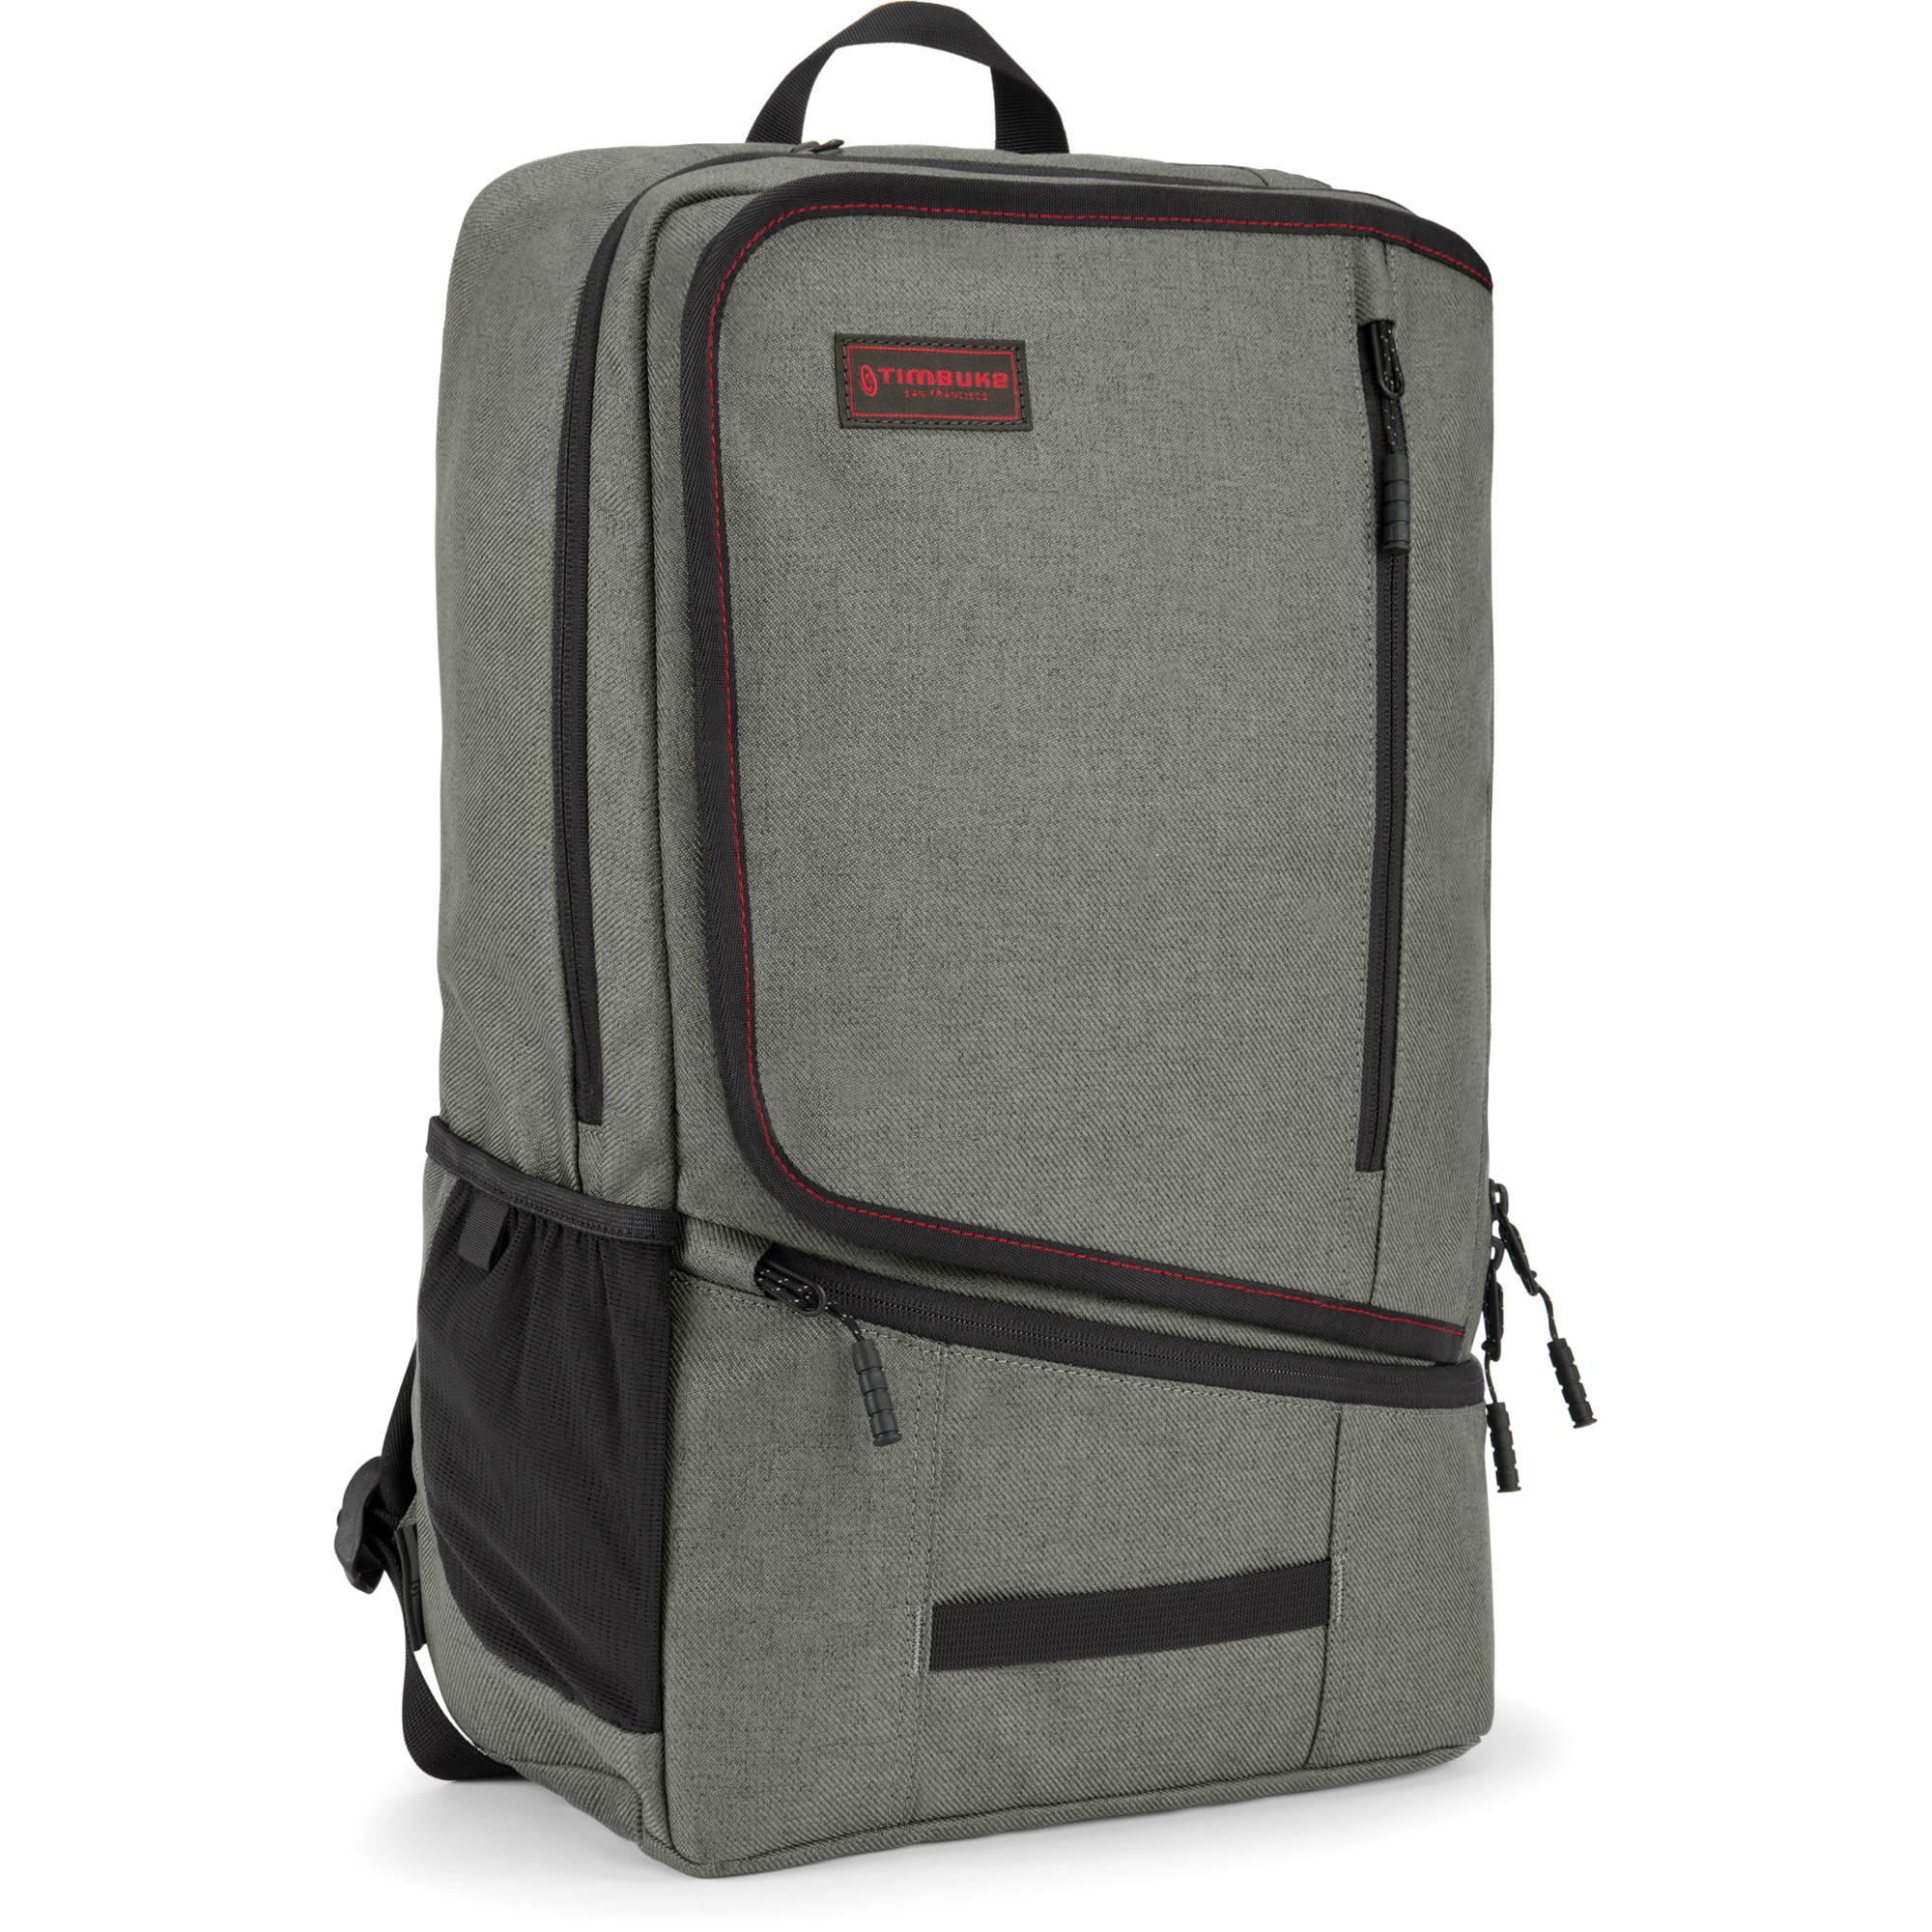 cff2be27eb6 Timbuk2 Q Laptop Backpack 2014 396-3-2226 B H Photo Video